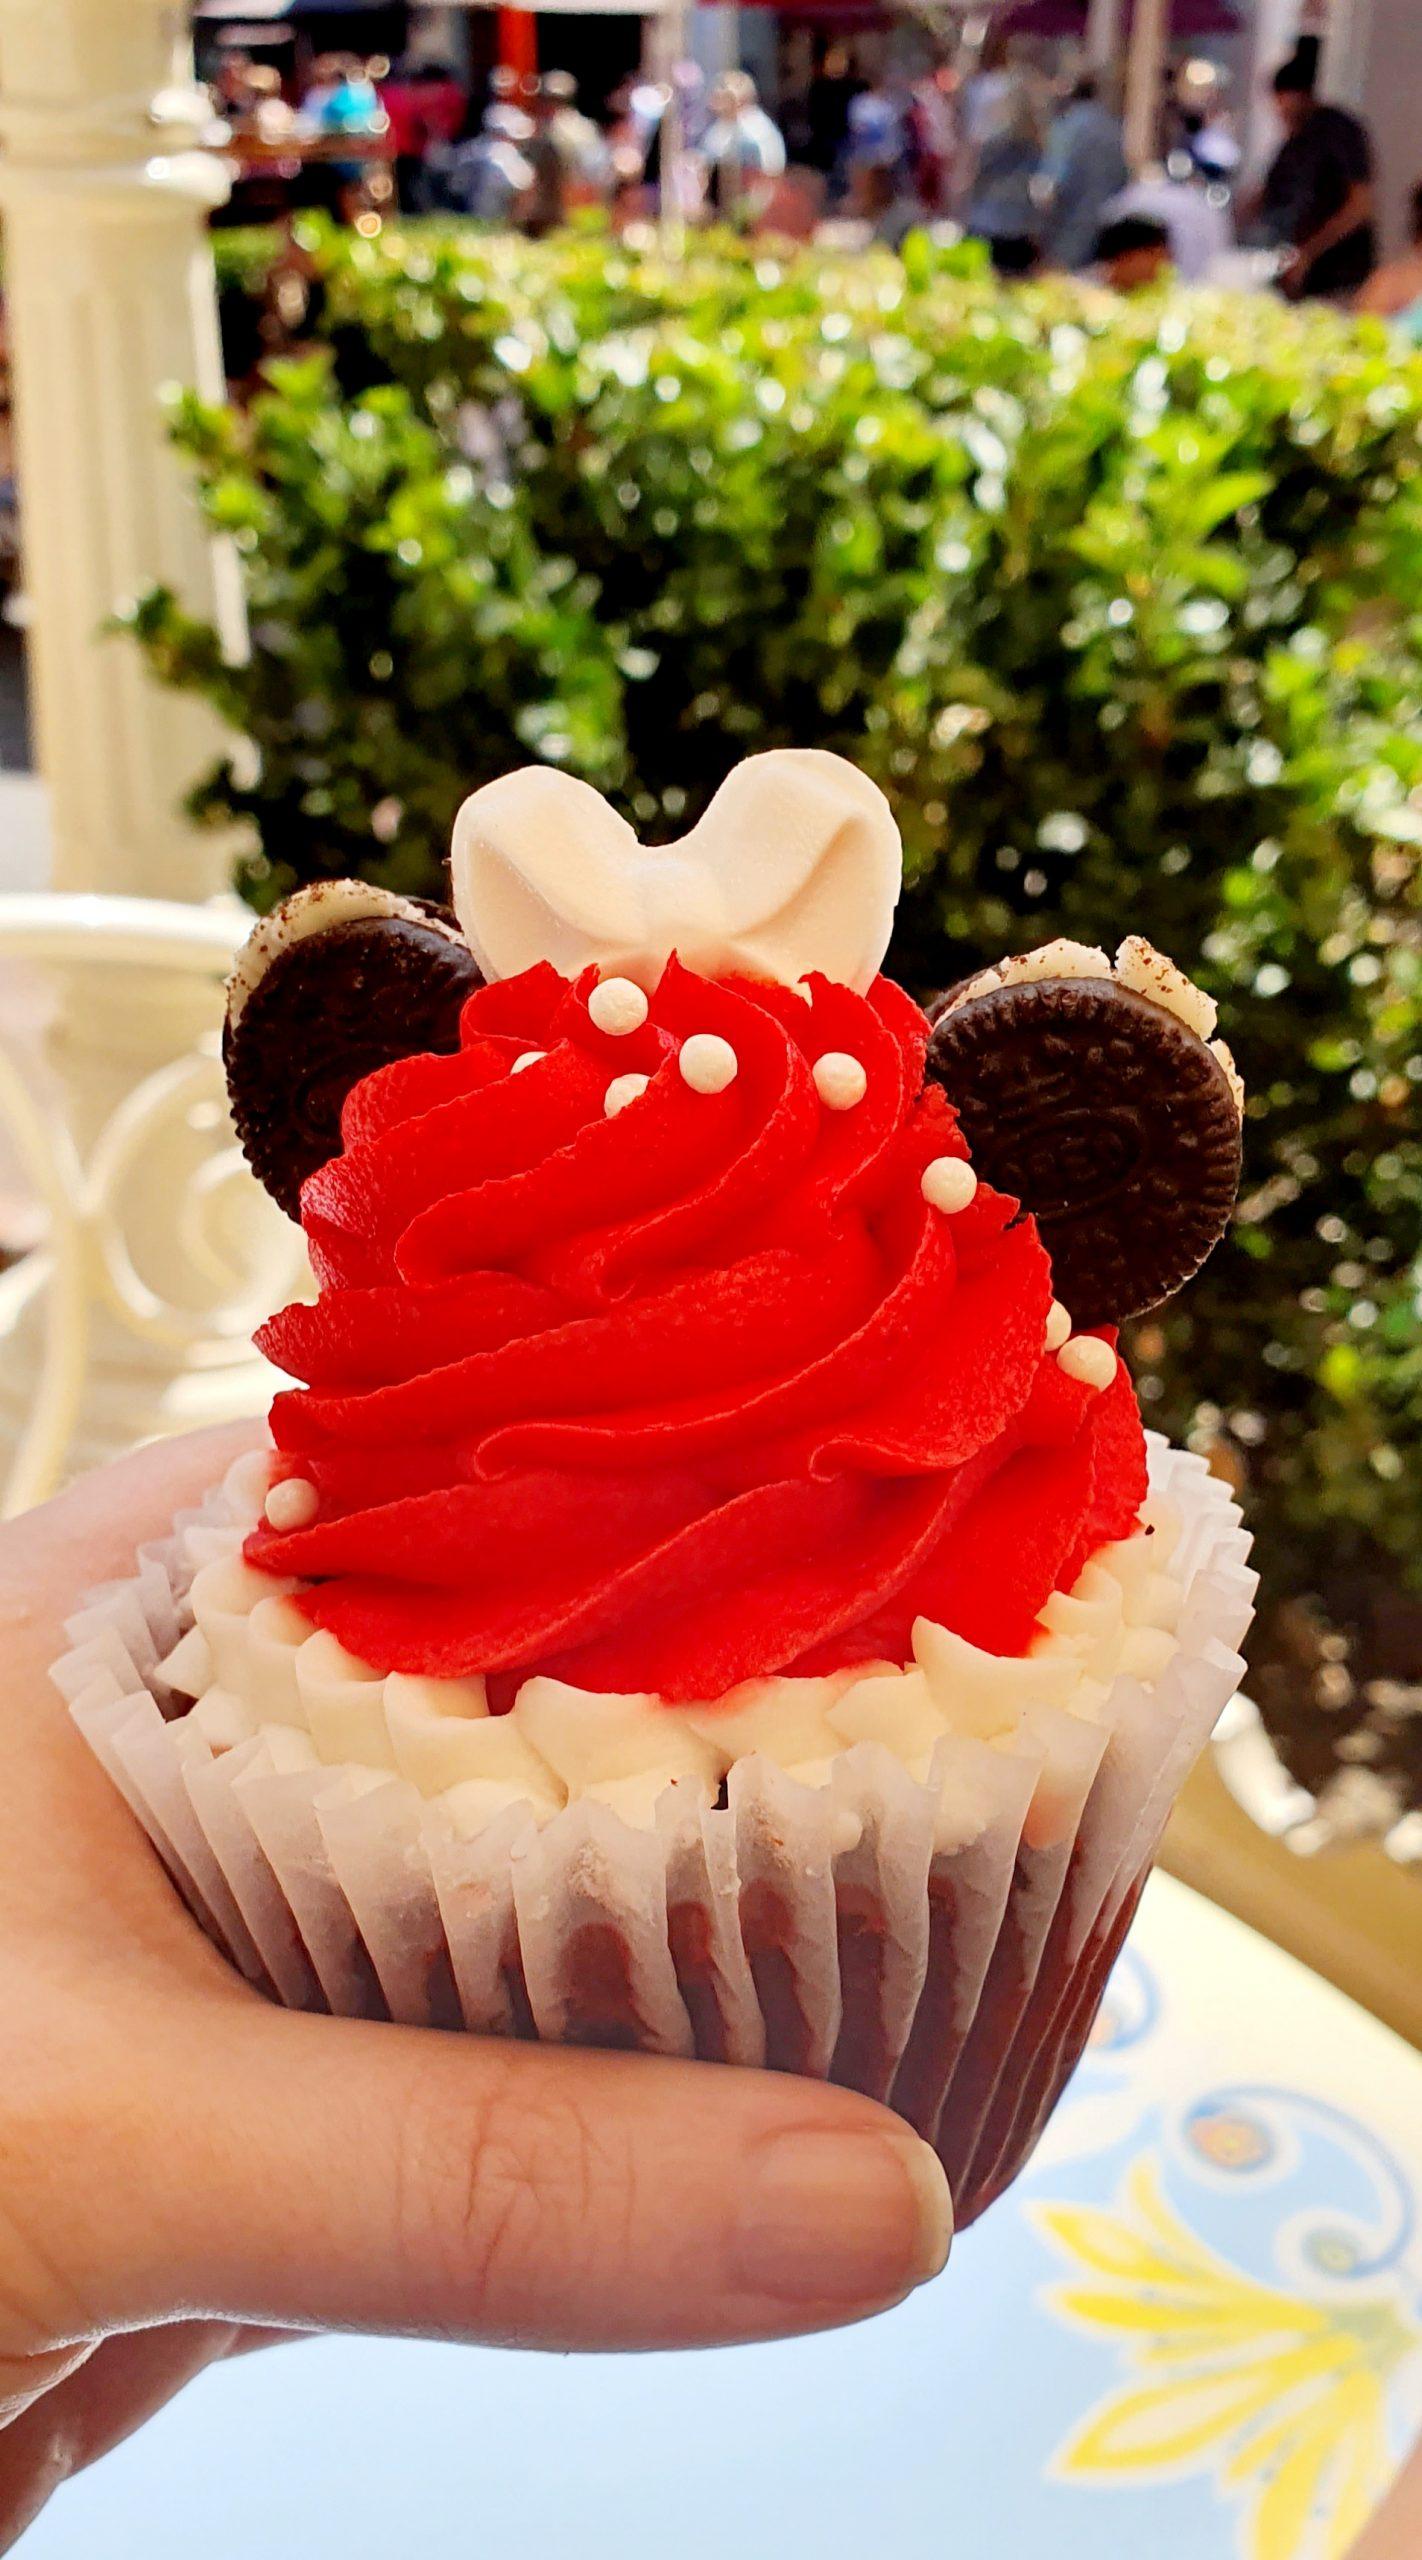 Disneyland Minnie Mouse Cupcake